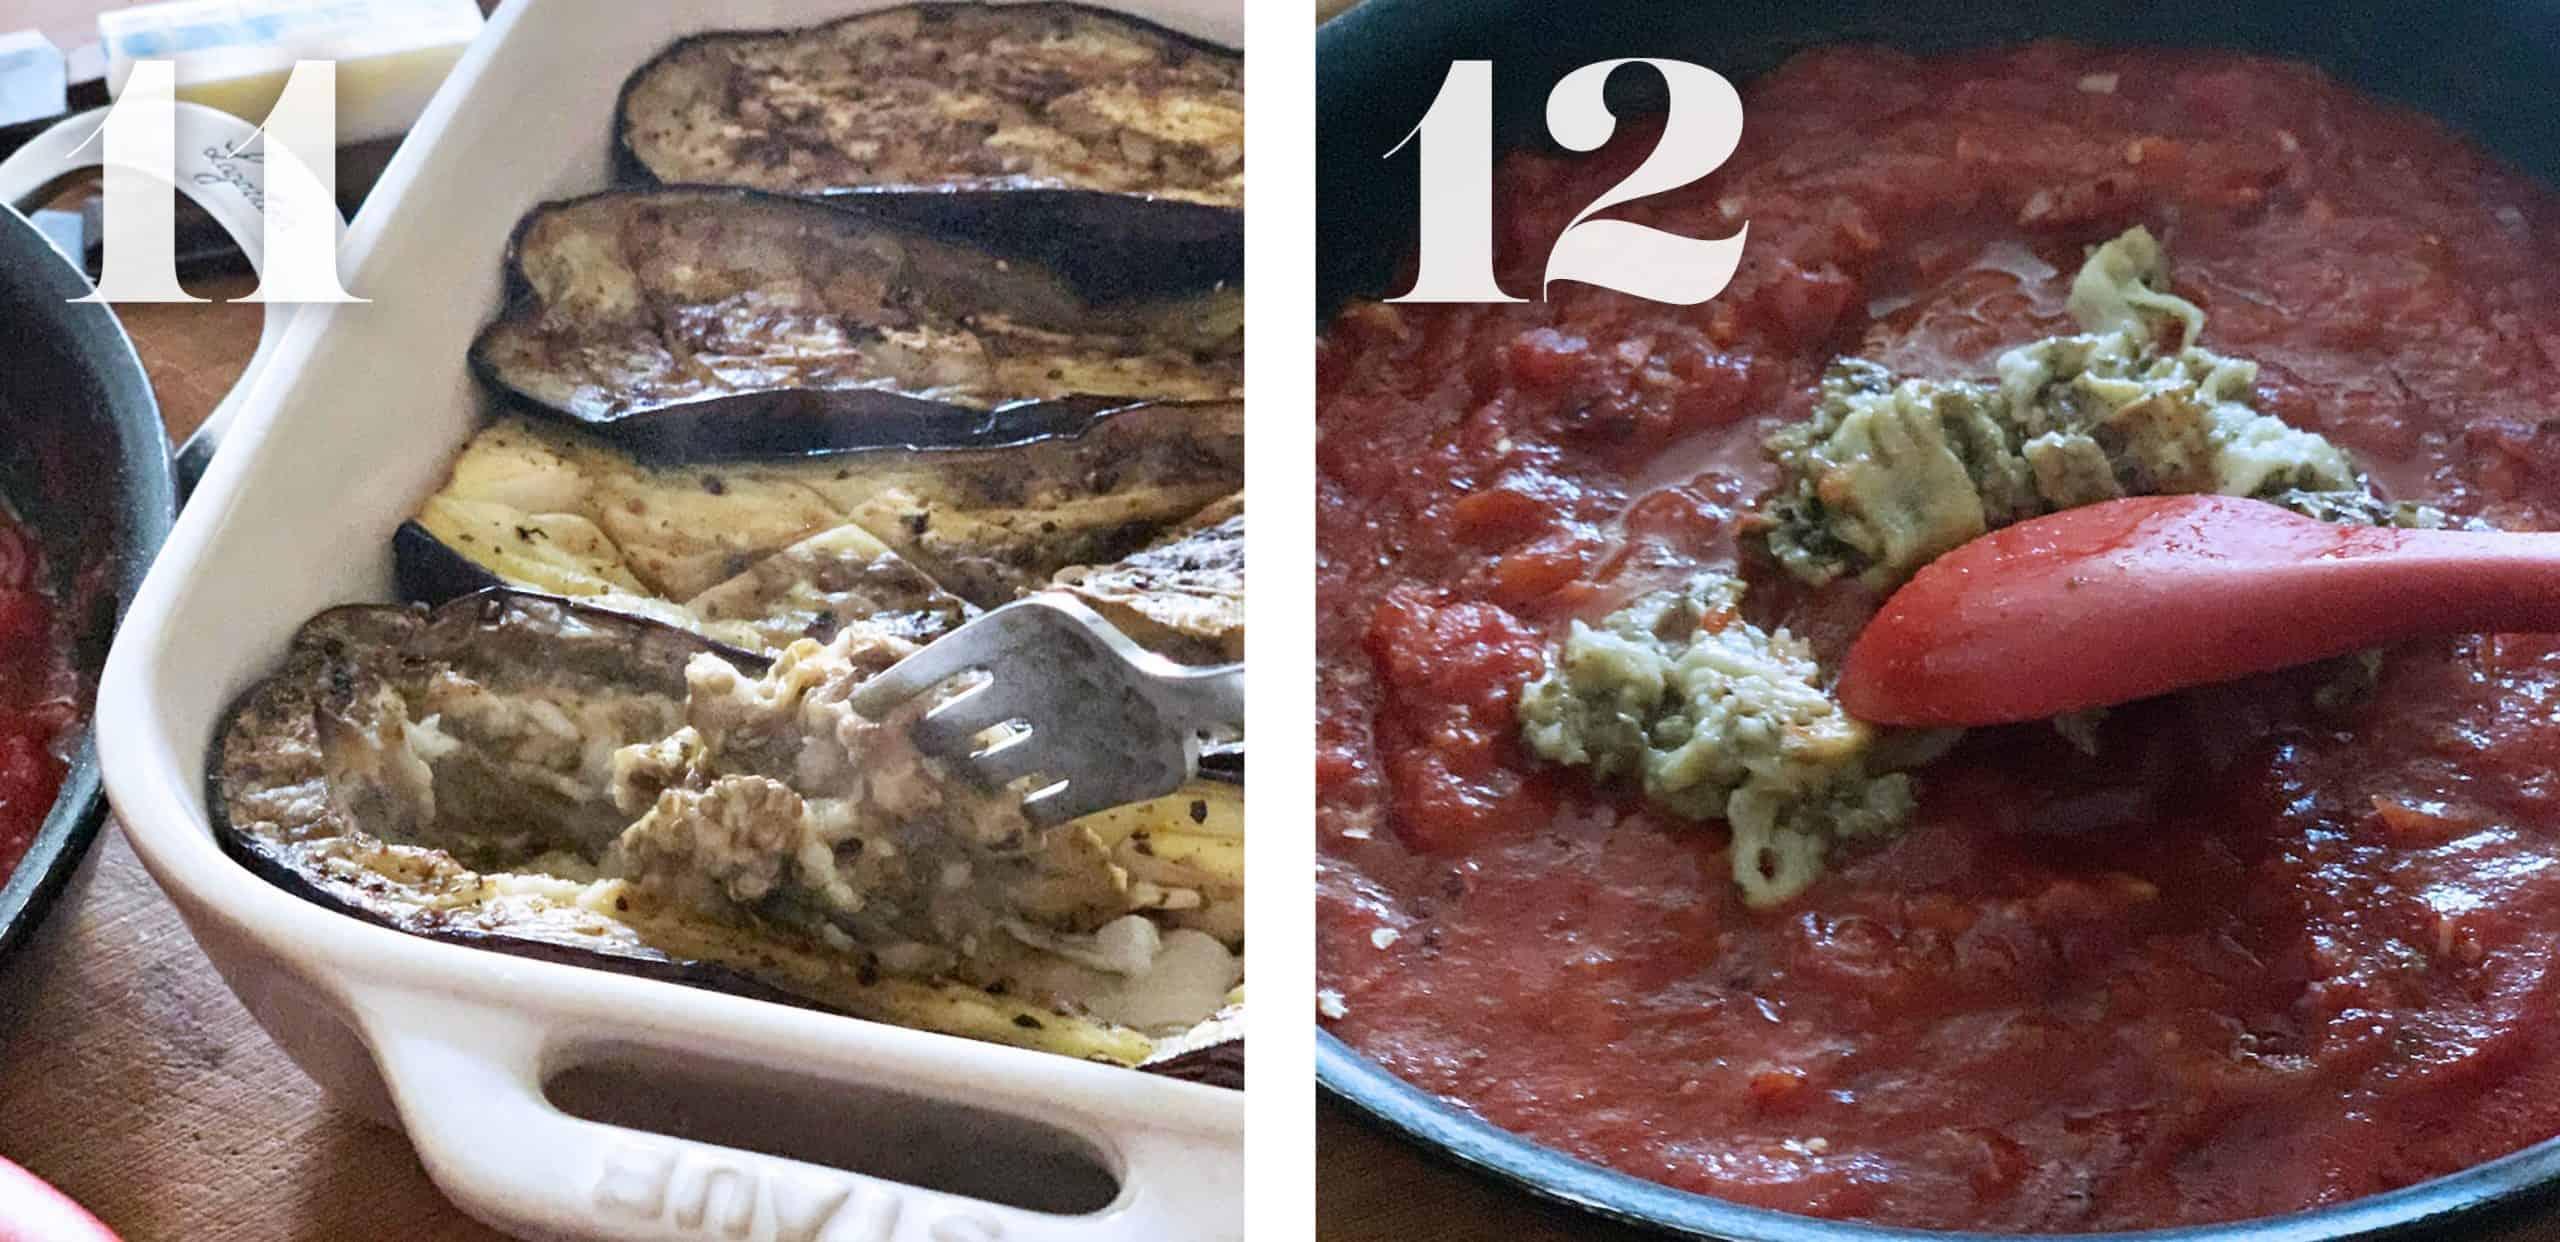 Image 11.Taking cooked eggplant flesh with a fork.  Image 12. Adding eggplant flesh to tomato sauce.